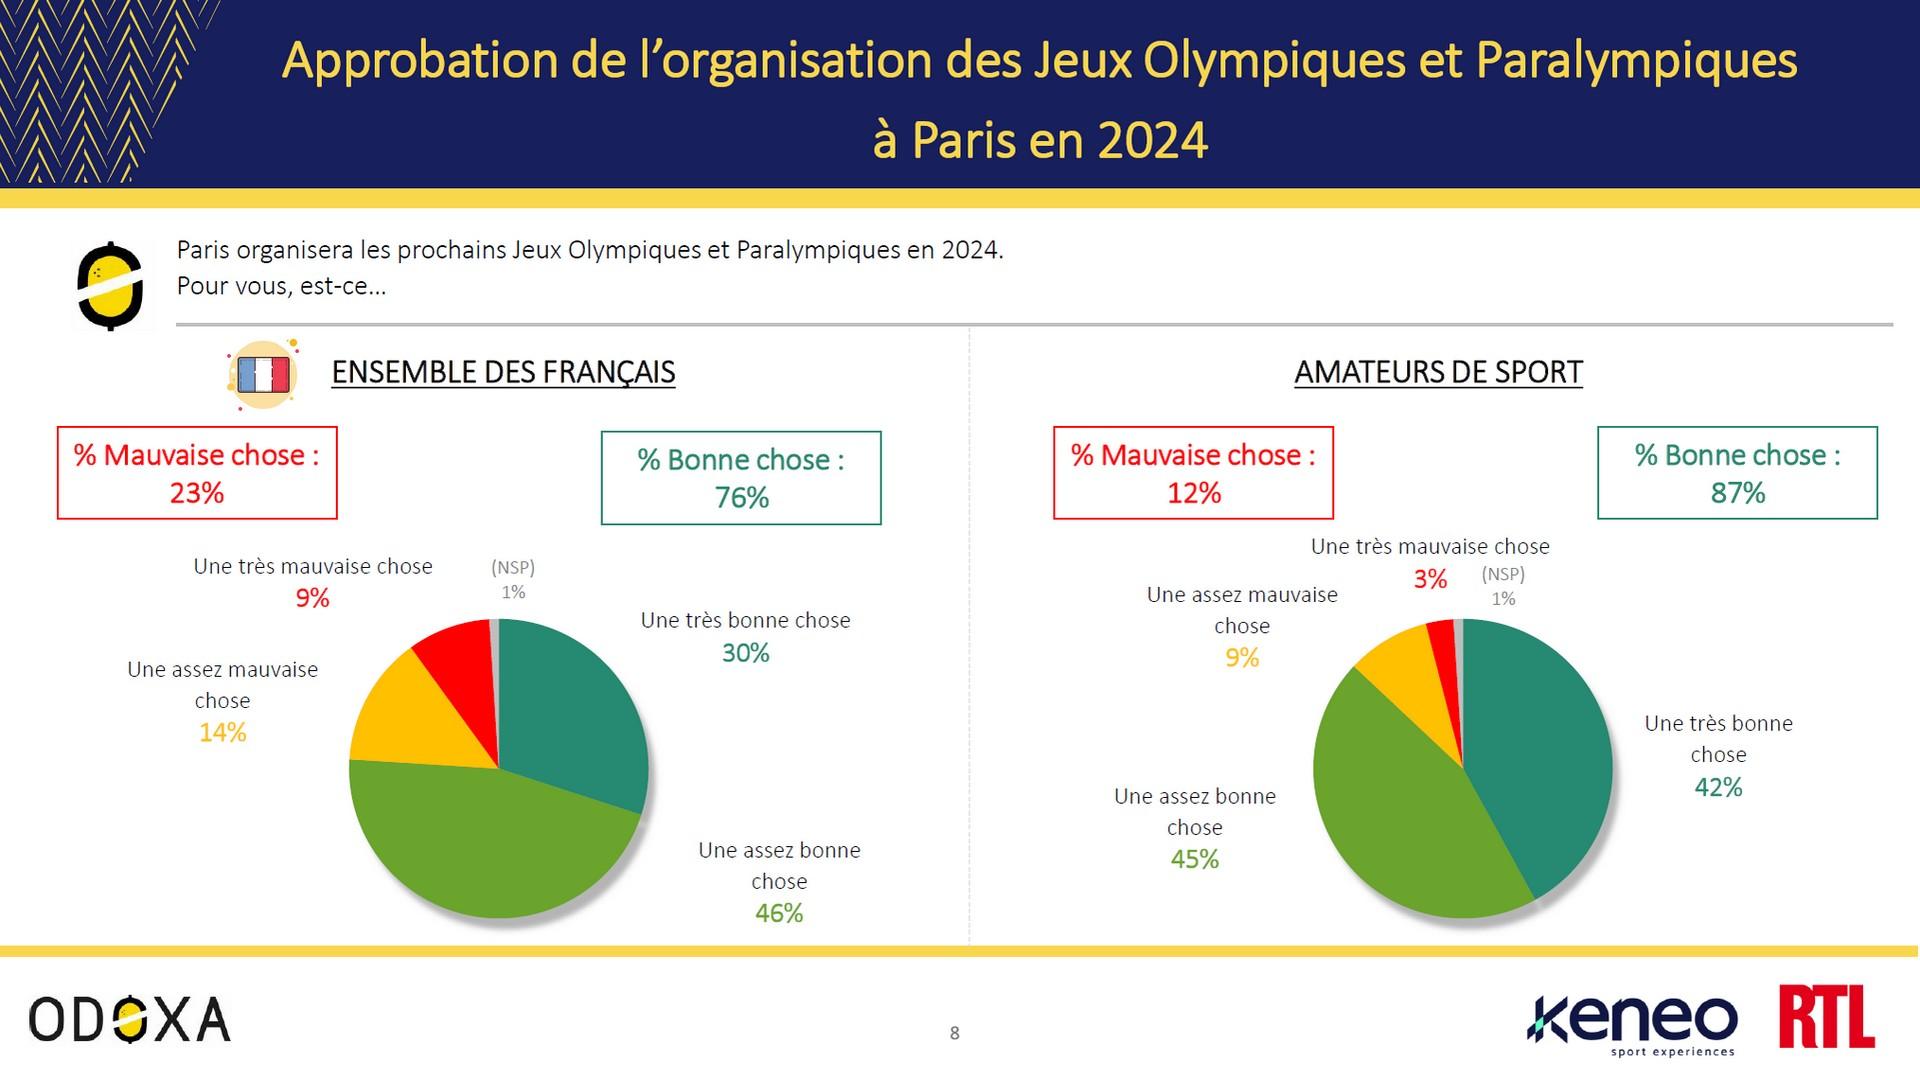 Sondage Odoxa Paris 2024 septembre 2021